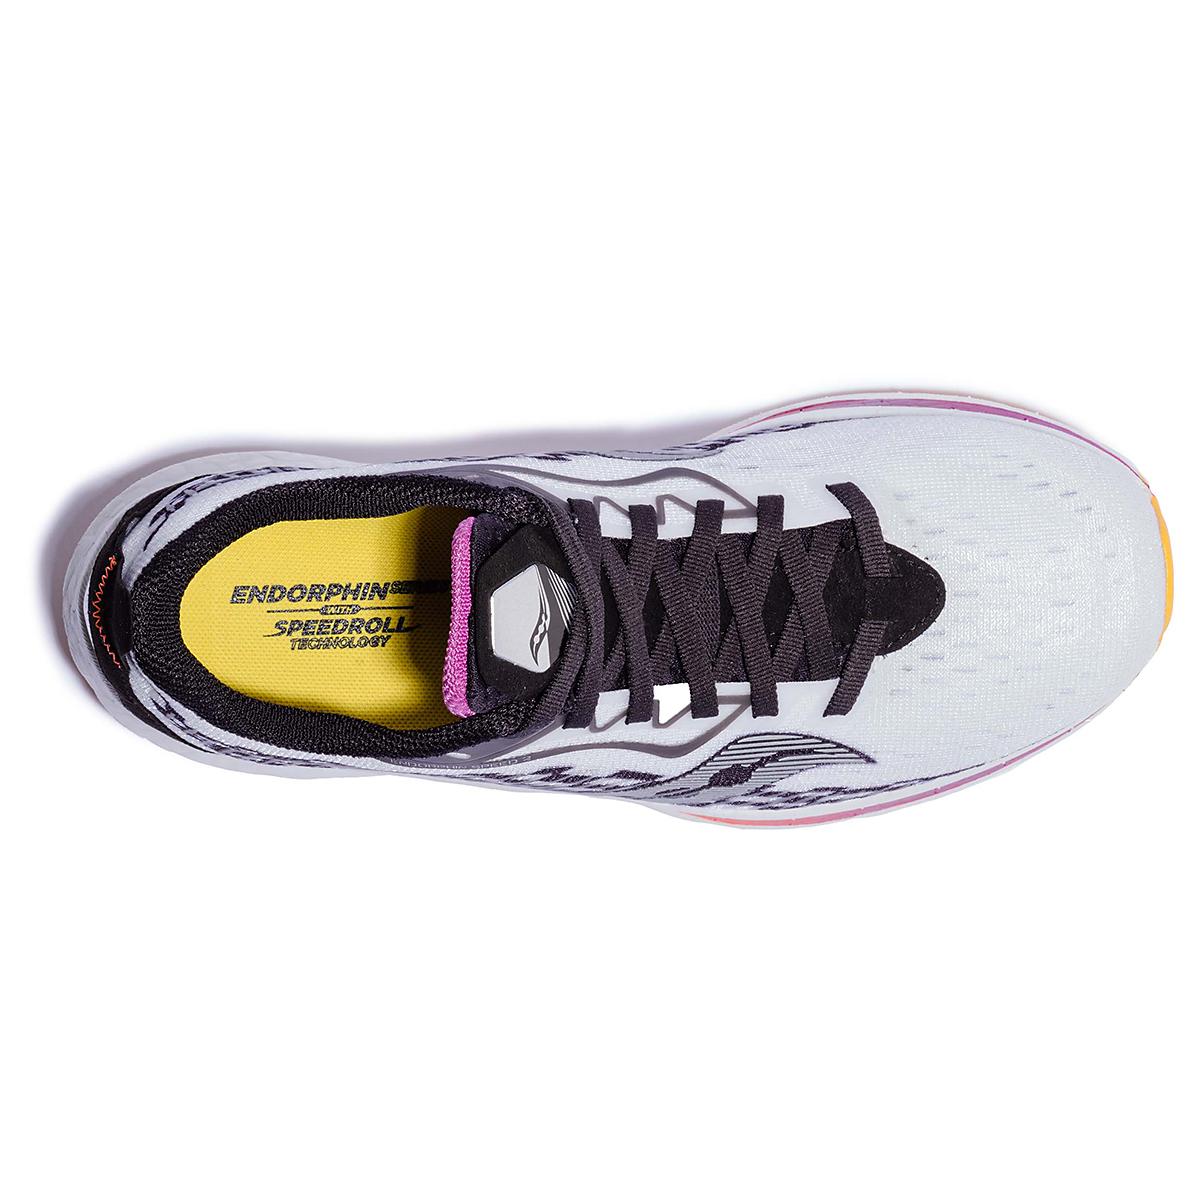 Women's Saucony Endorphin Speed 2 Running Shoe - Color: Reverie - Size: 5 - Width: Regular, Reverie, large, image 3